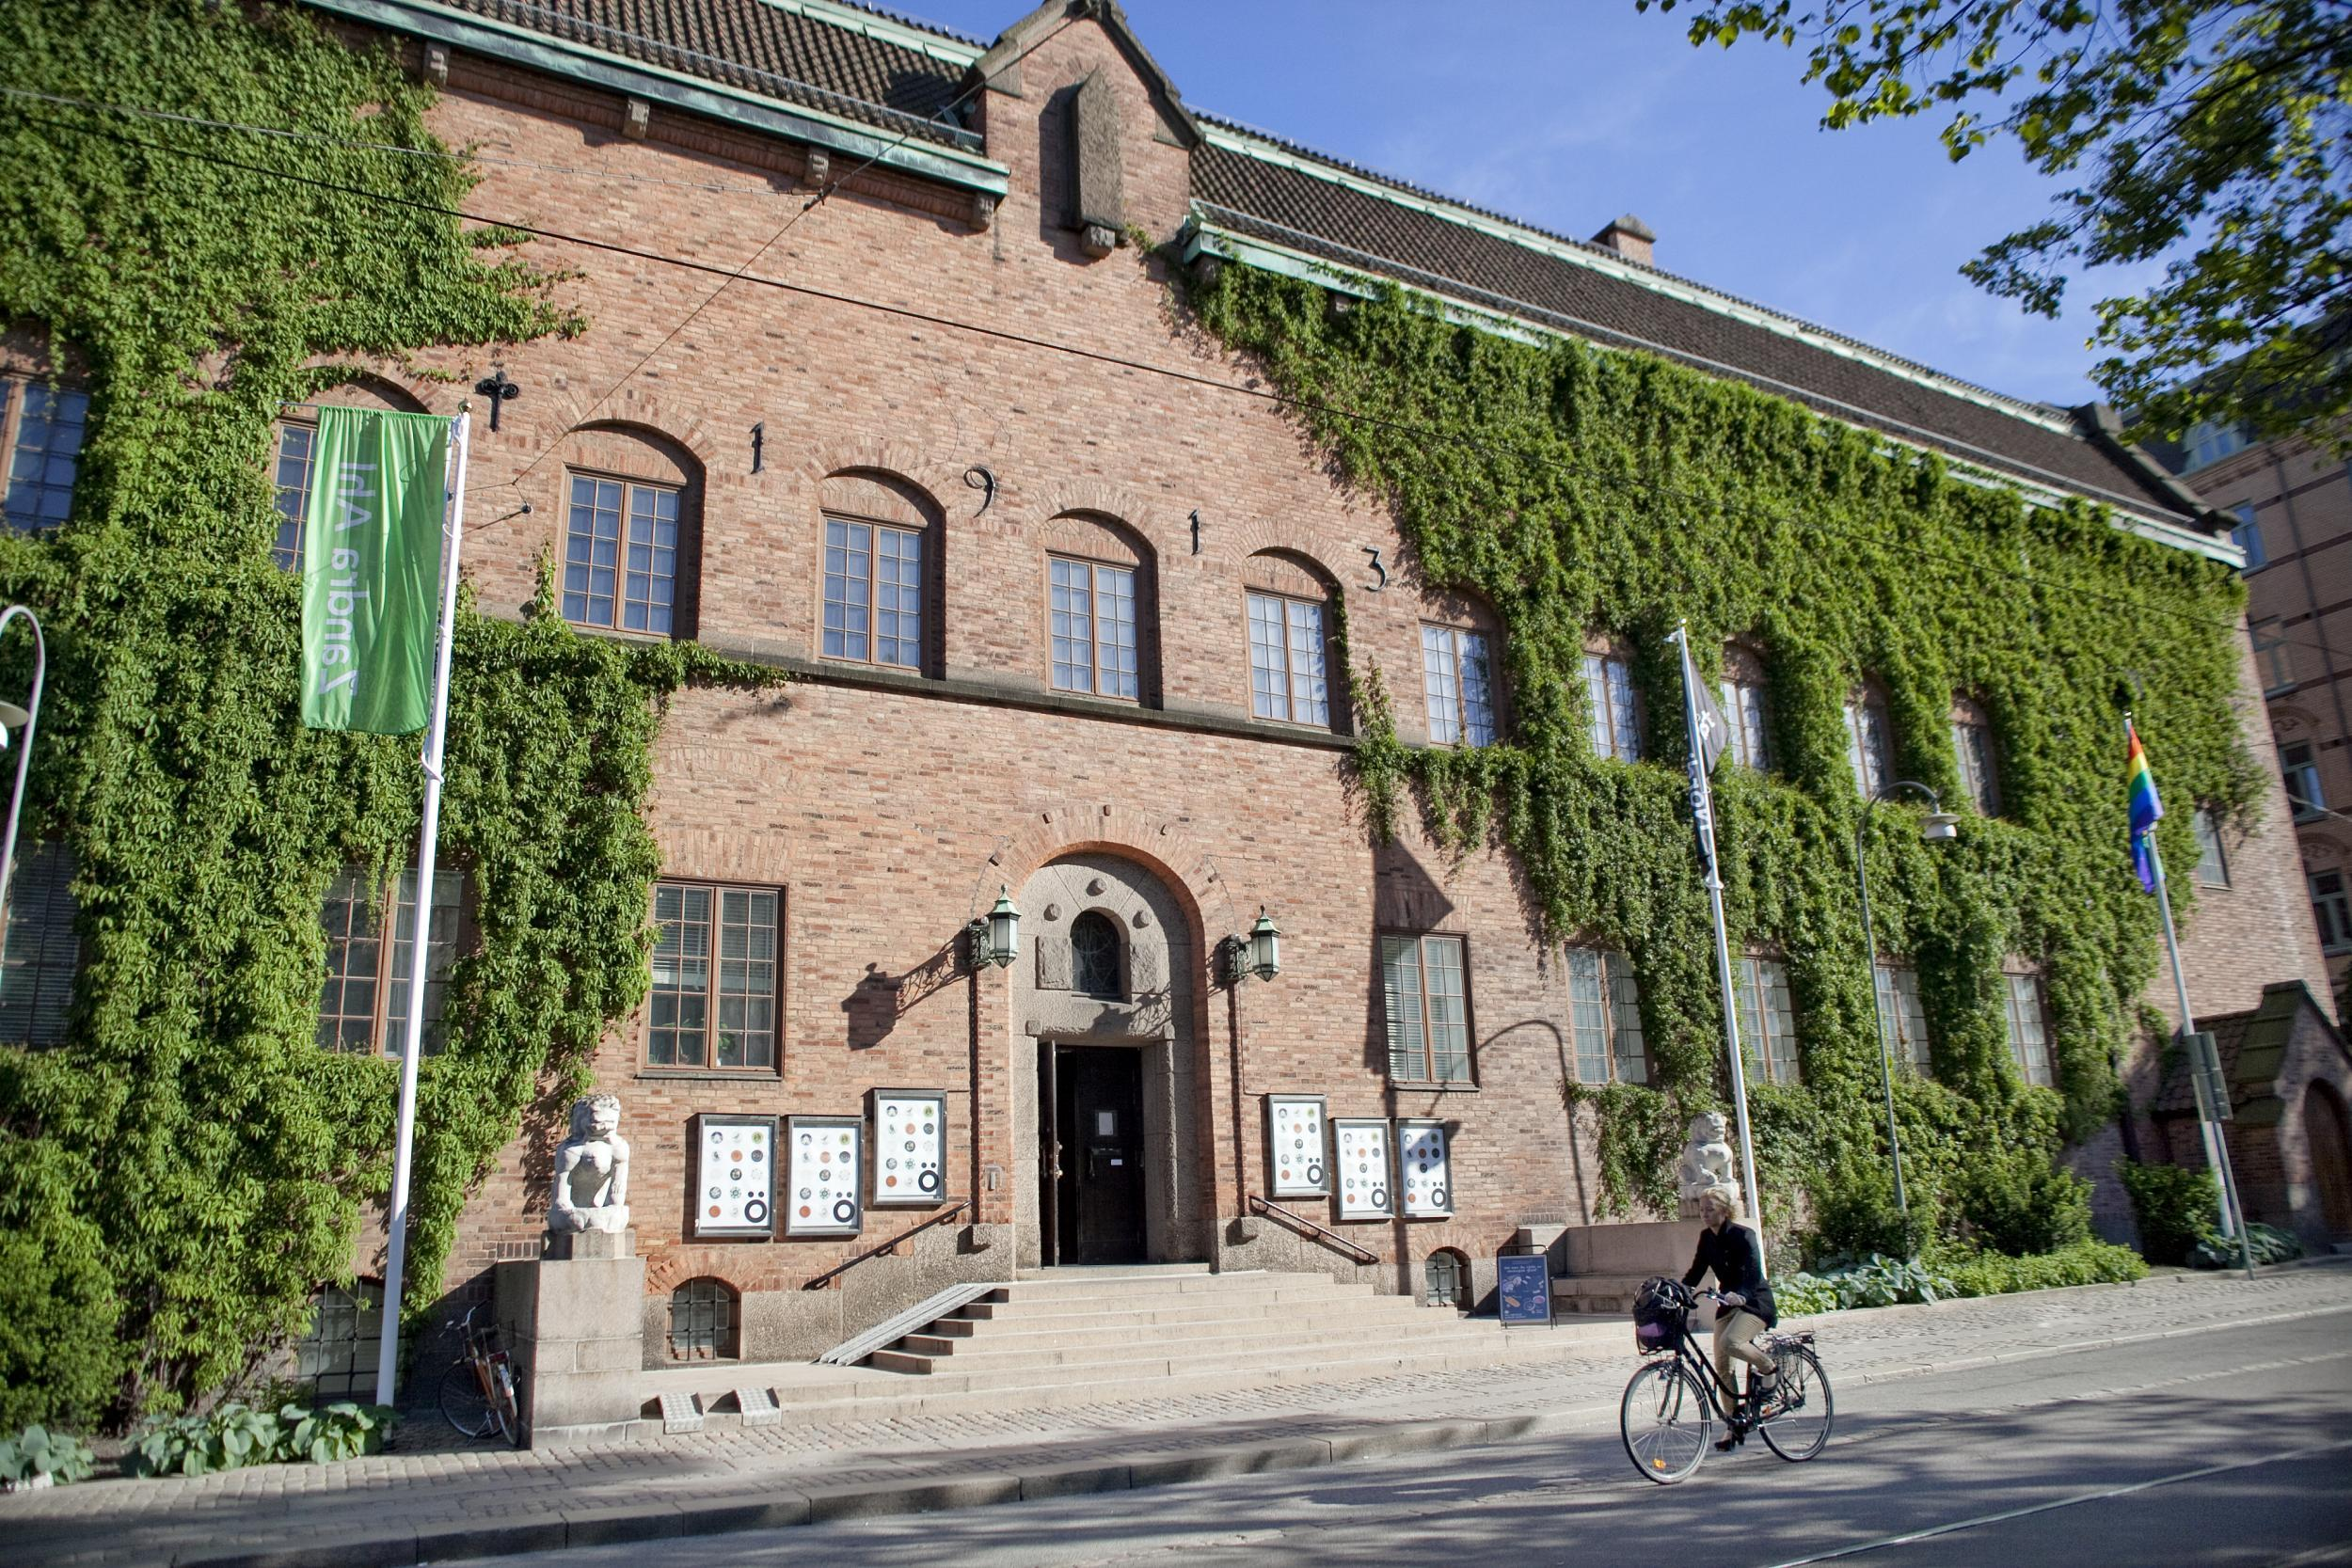 Göteborg massage spa västra götaland